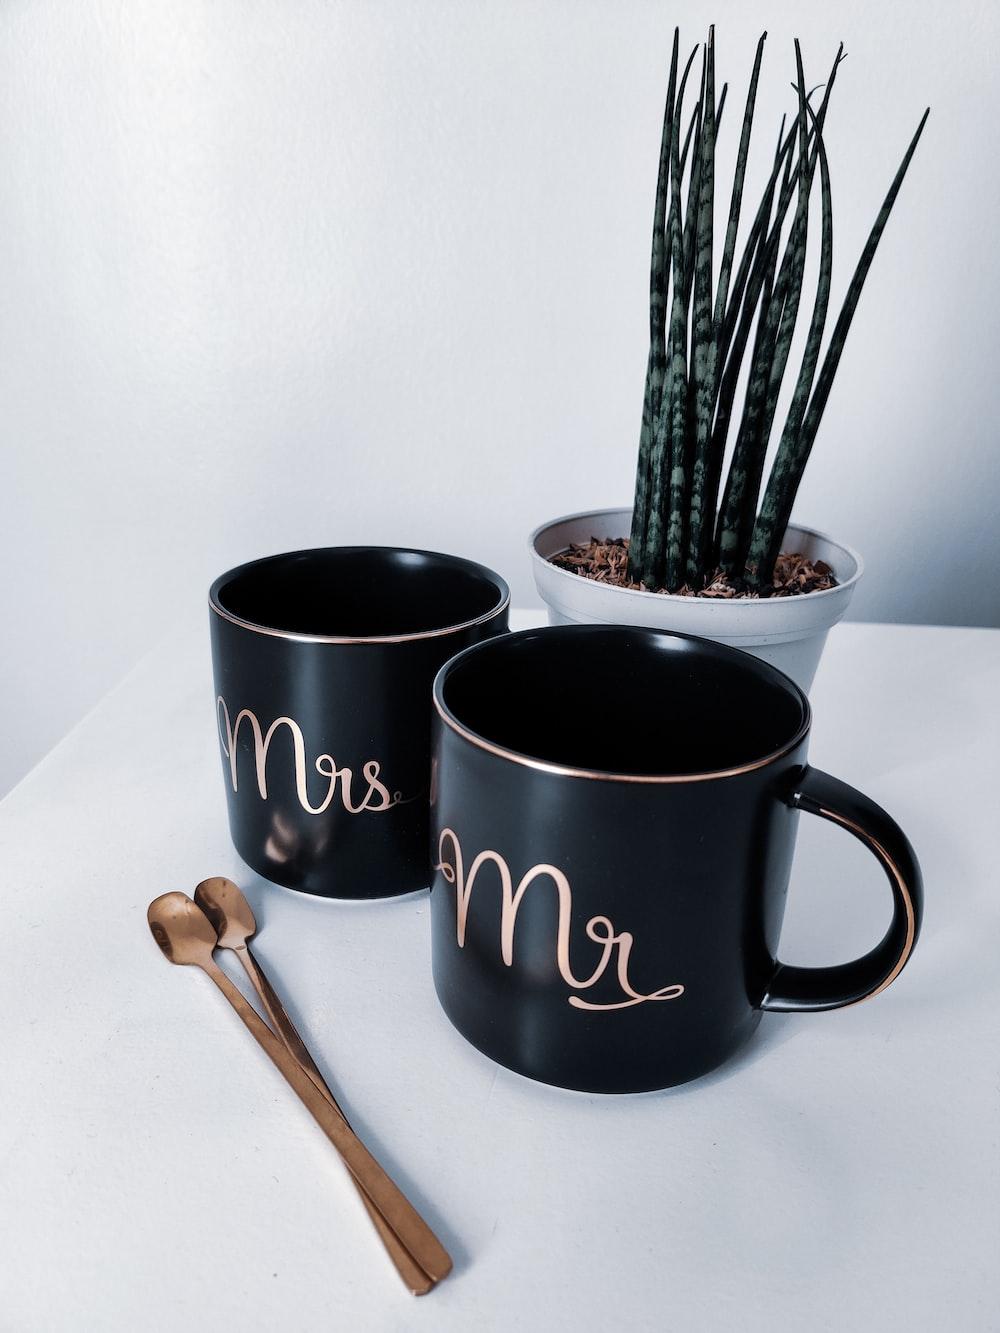 black and white ceramic mug